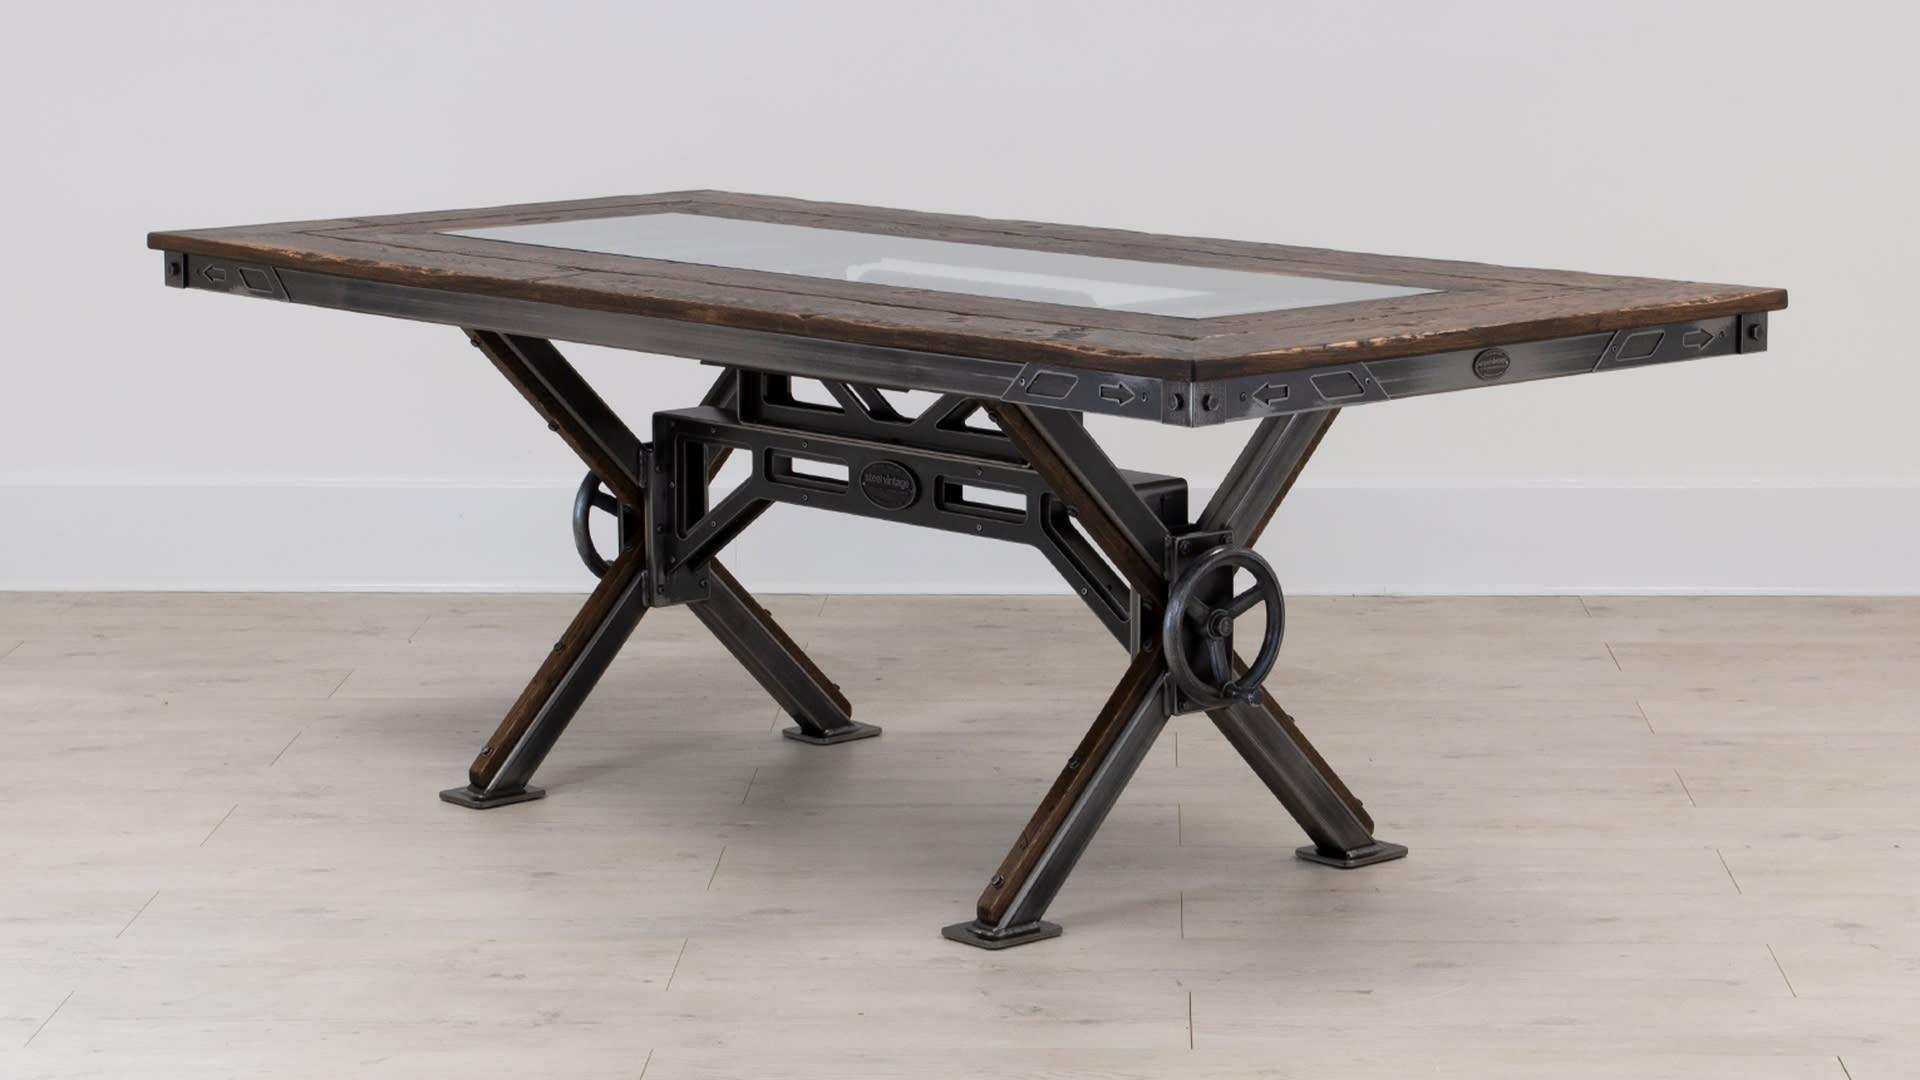 STEEL VINTAGE STEAMPUNK TABLE